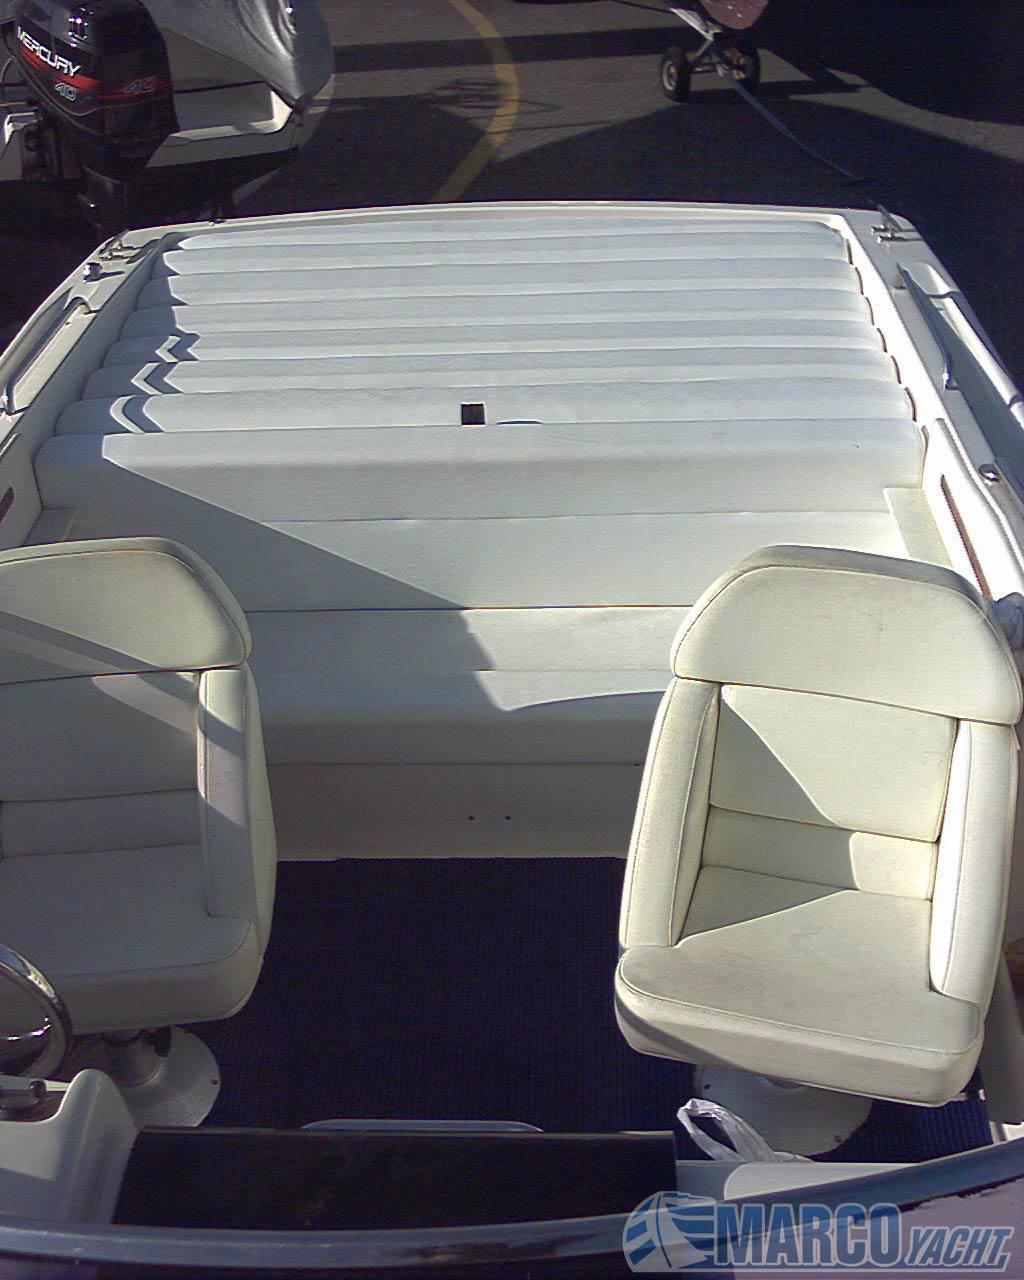 ILVER 24 nyuma Motor boat used for sale